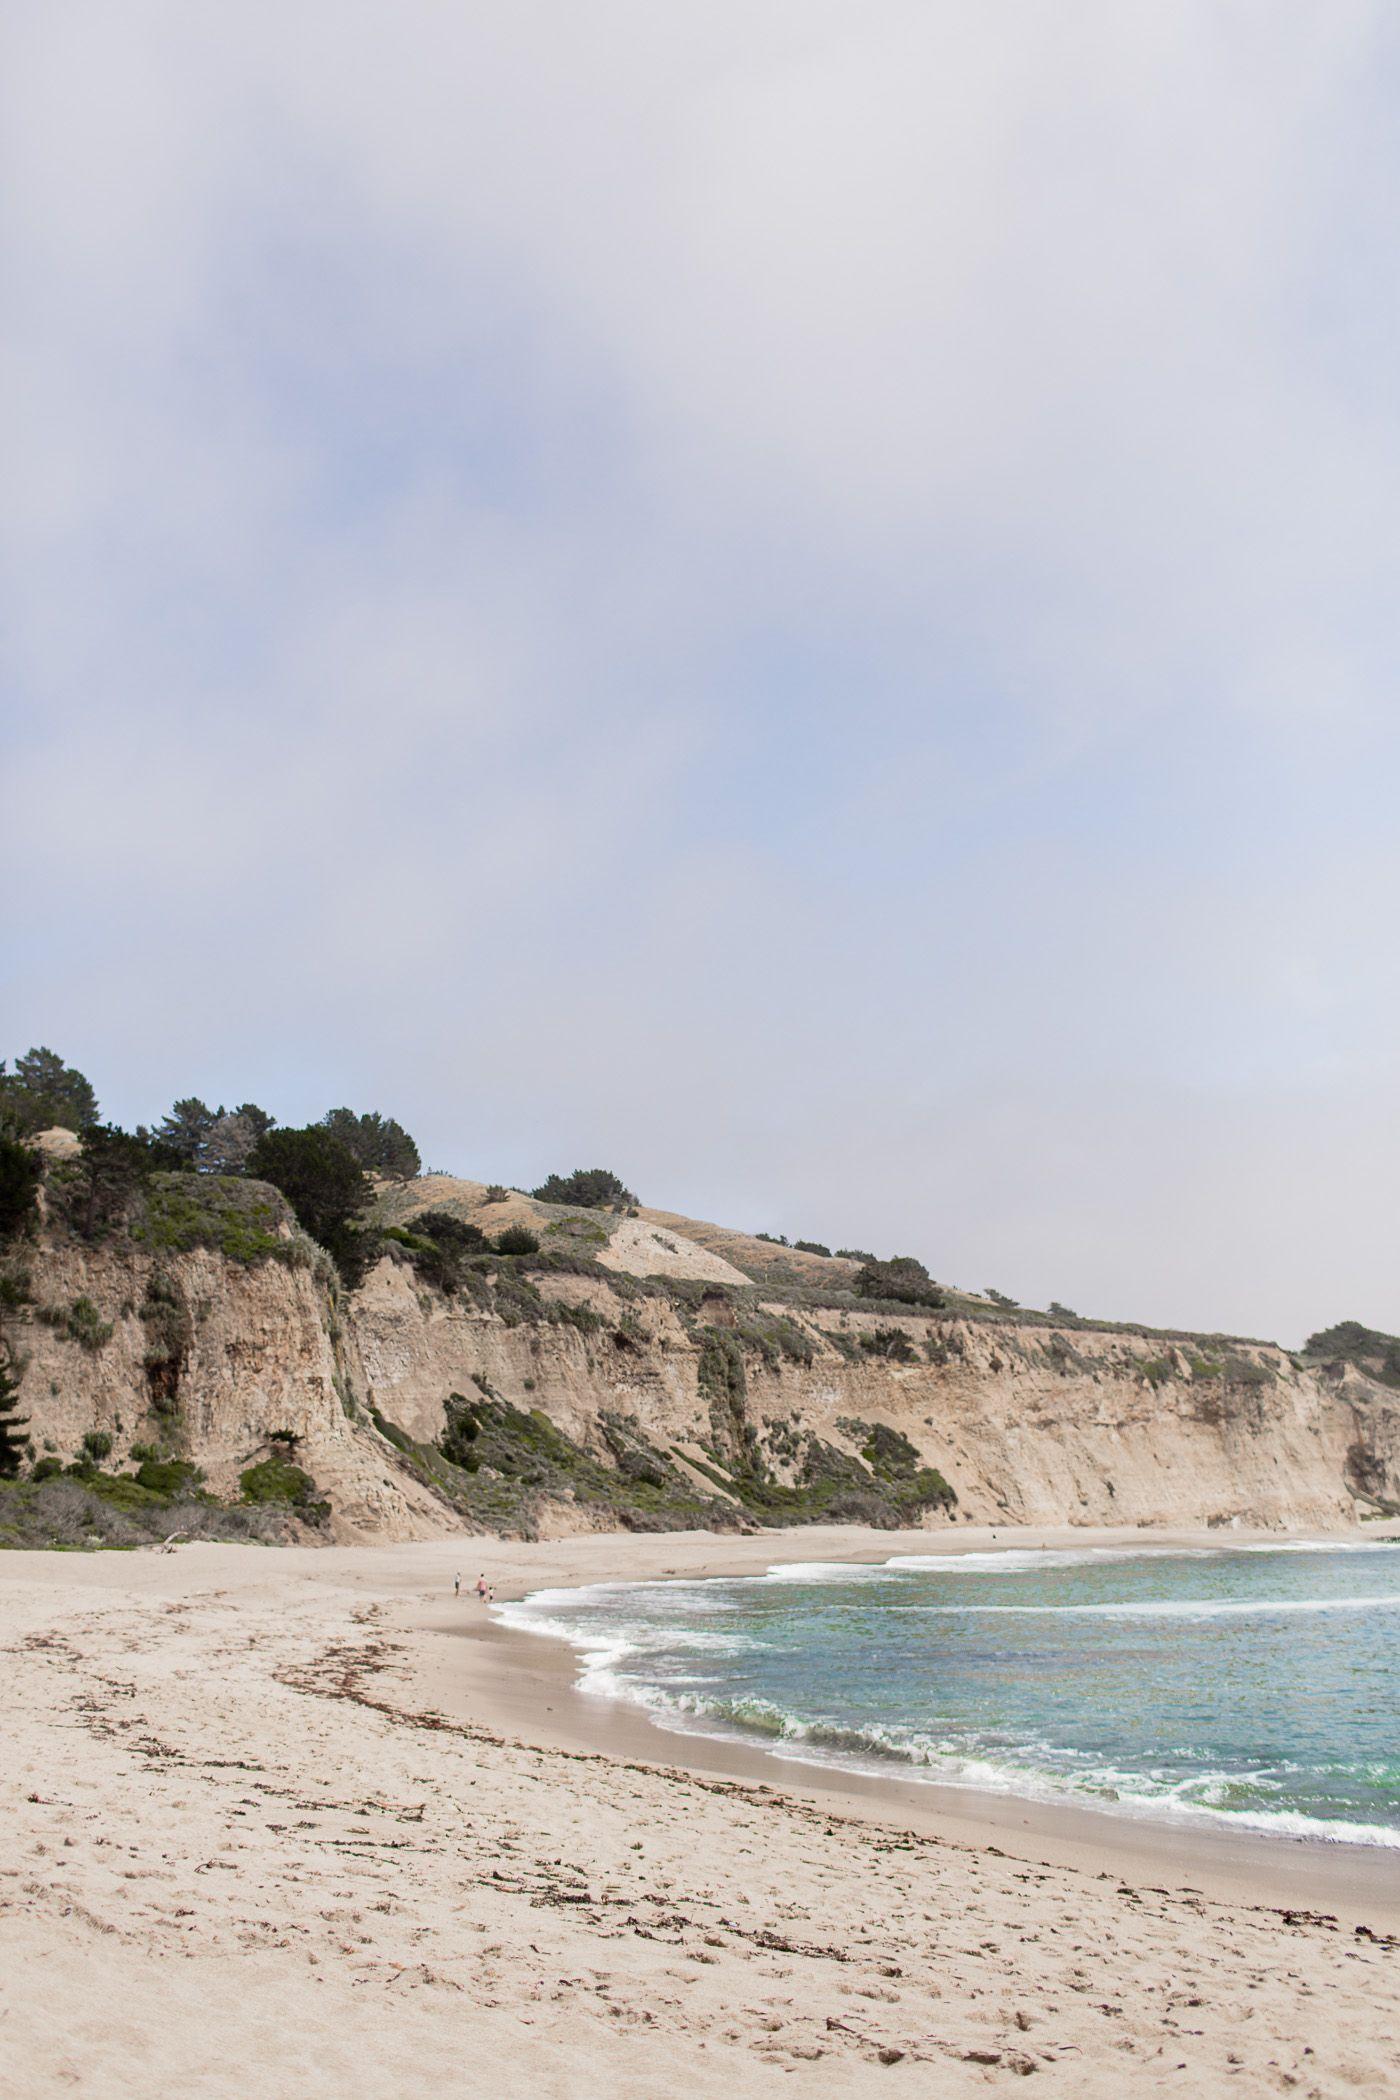 Pin by 03 on AutUmN | Fall travel, California travel, Julian california